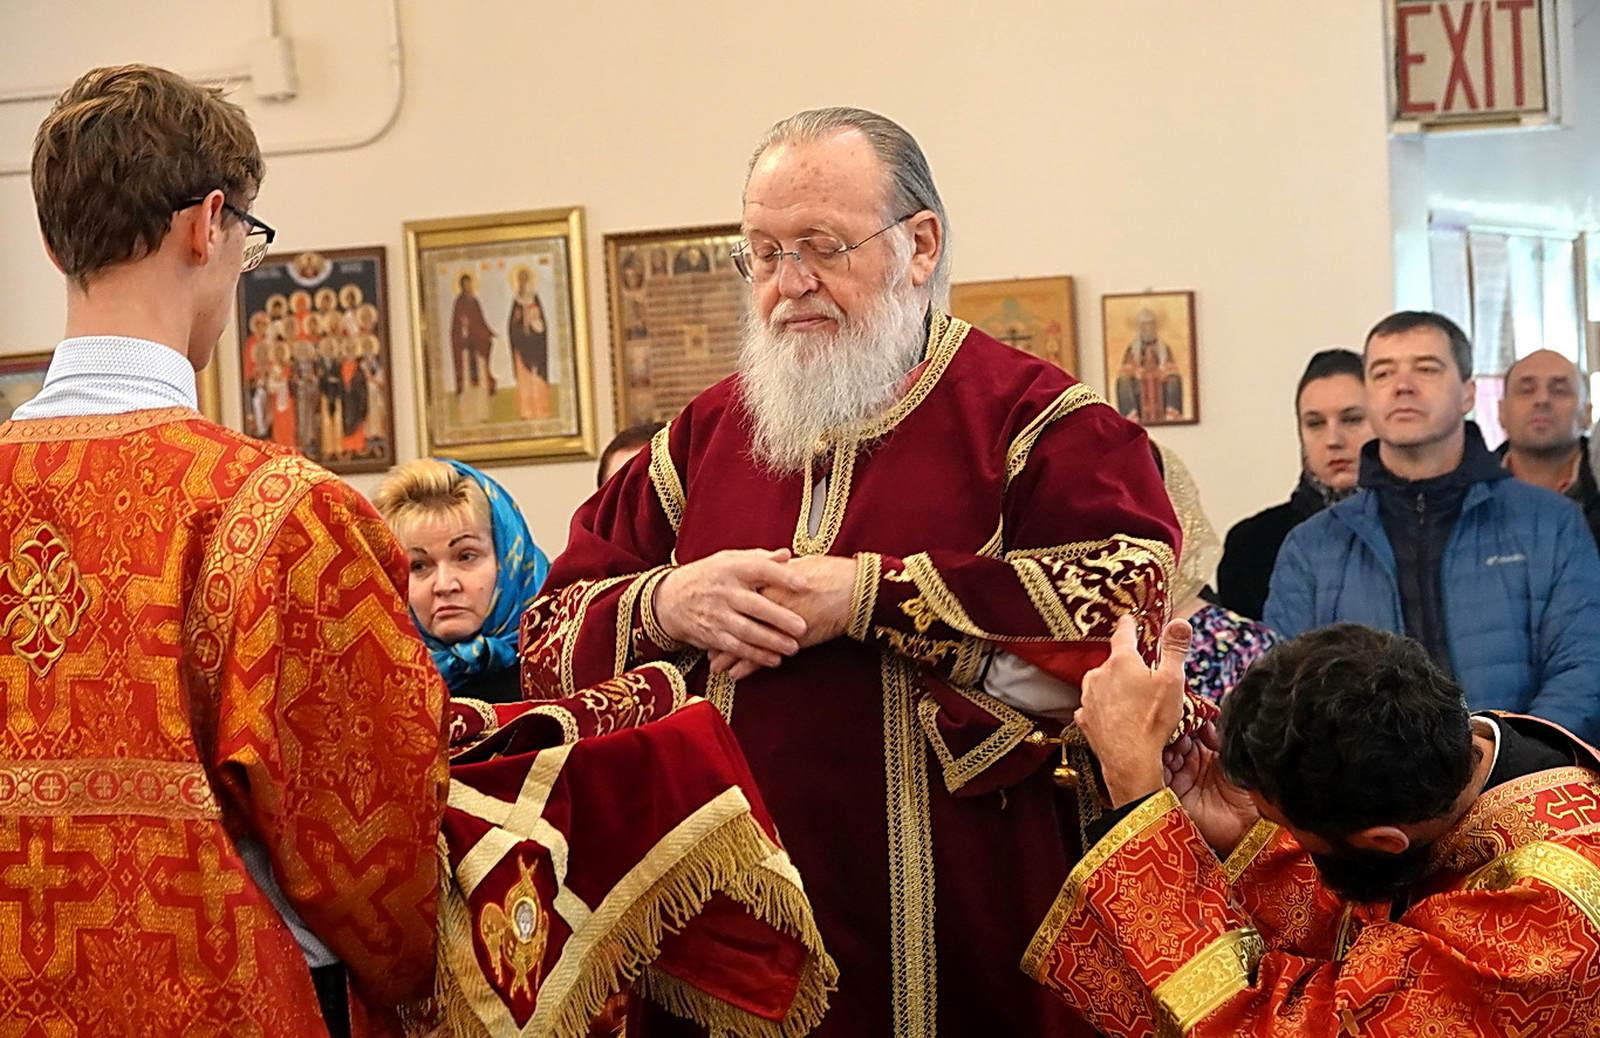 Prestol-prazdnik_10-Feb-2019_23